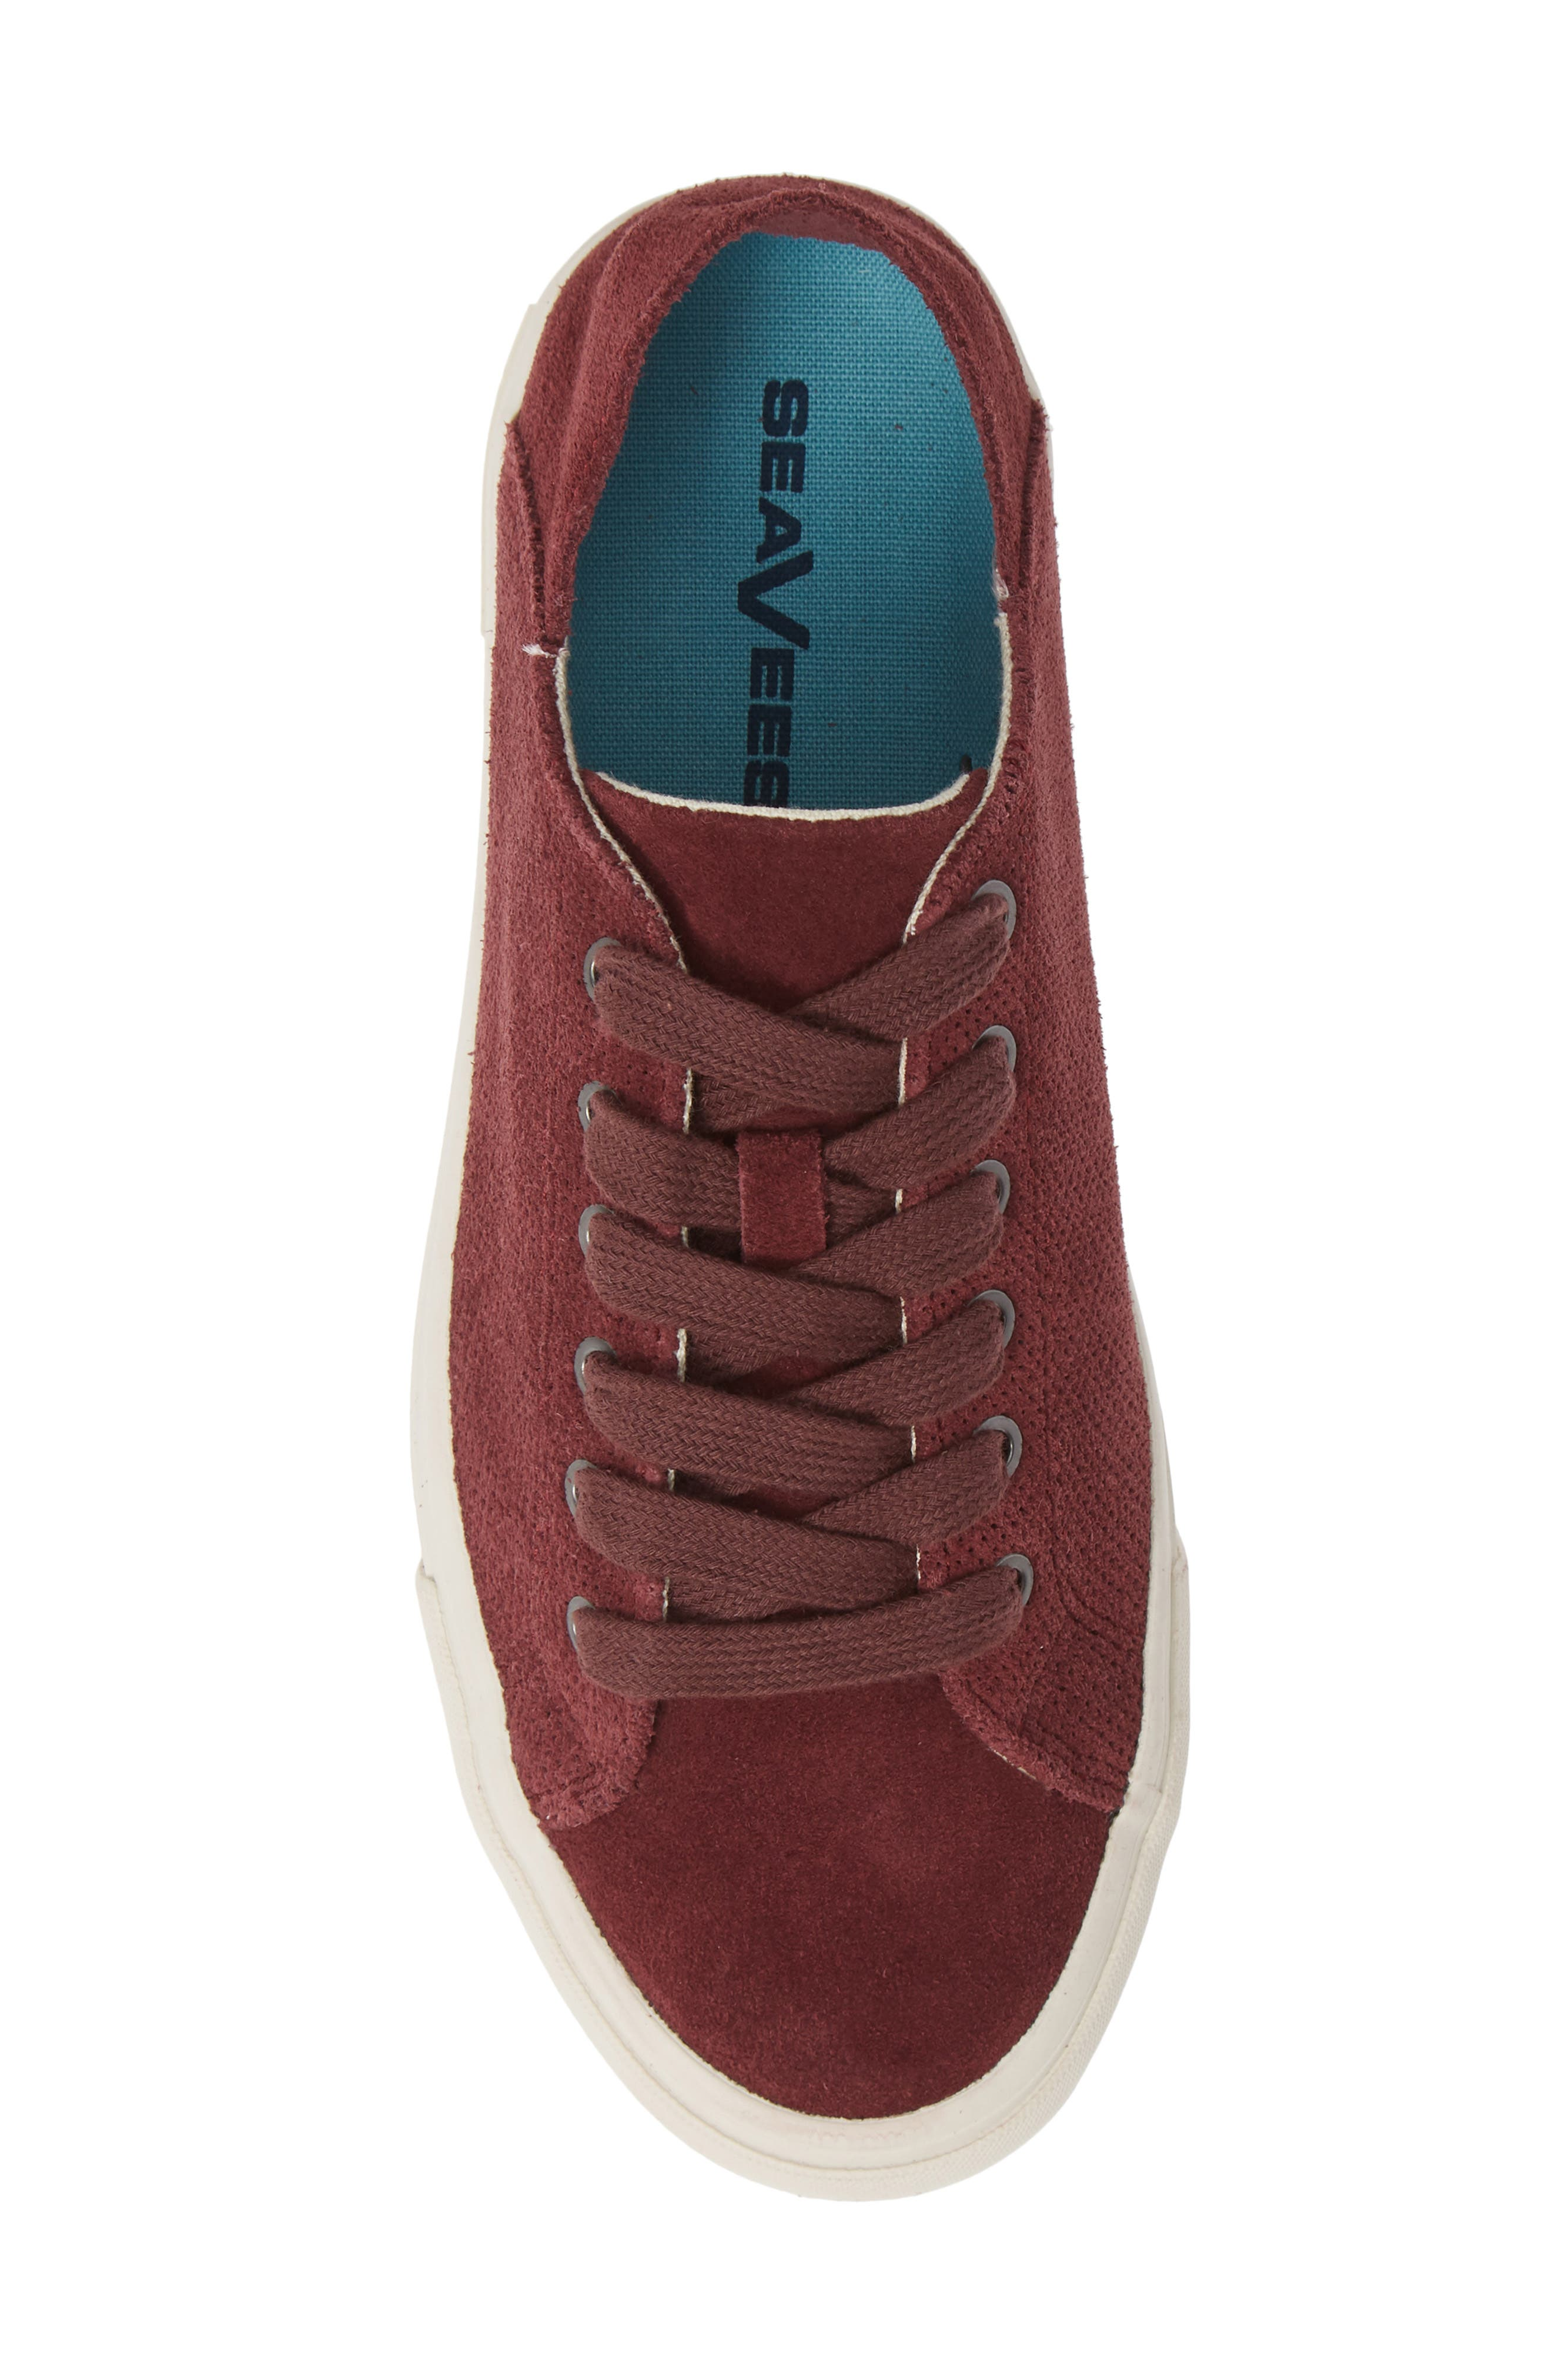 Sausalito Sneaker,                             Alternate thumbnail 5, color,                             WINE